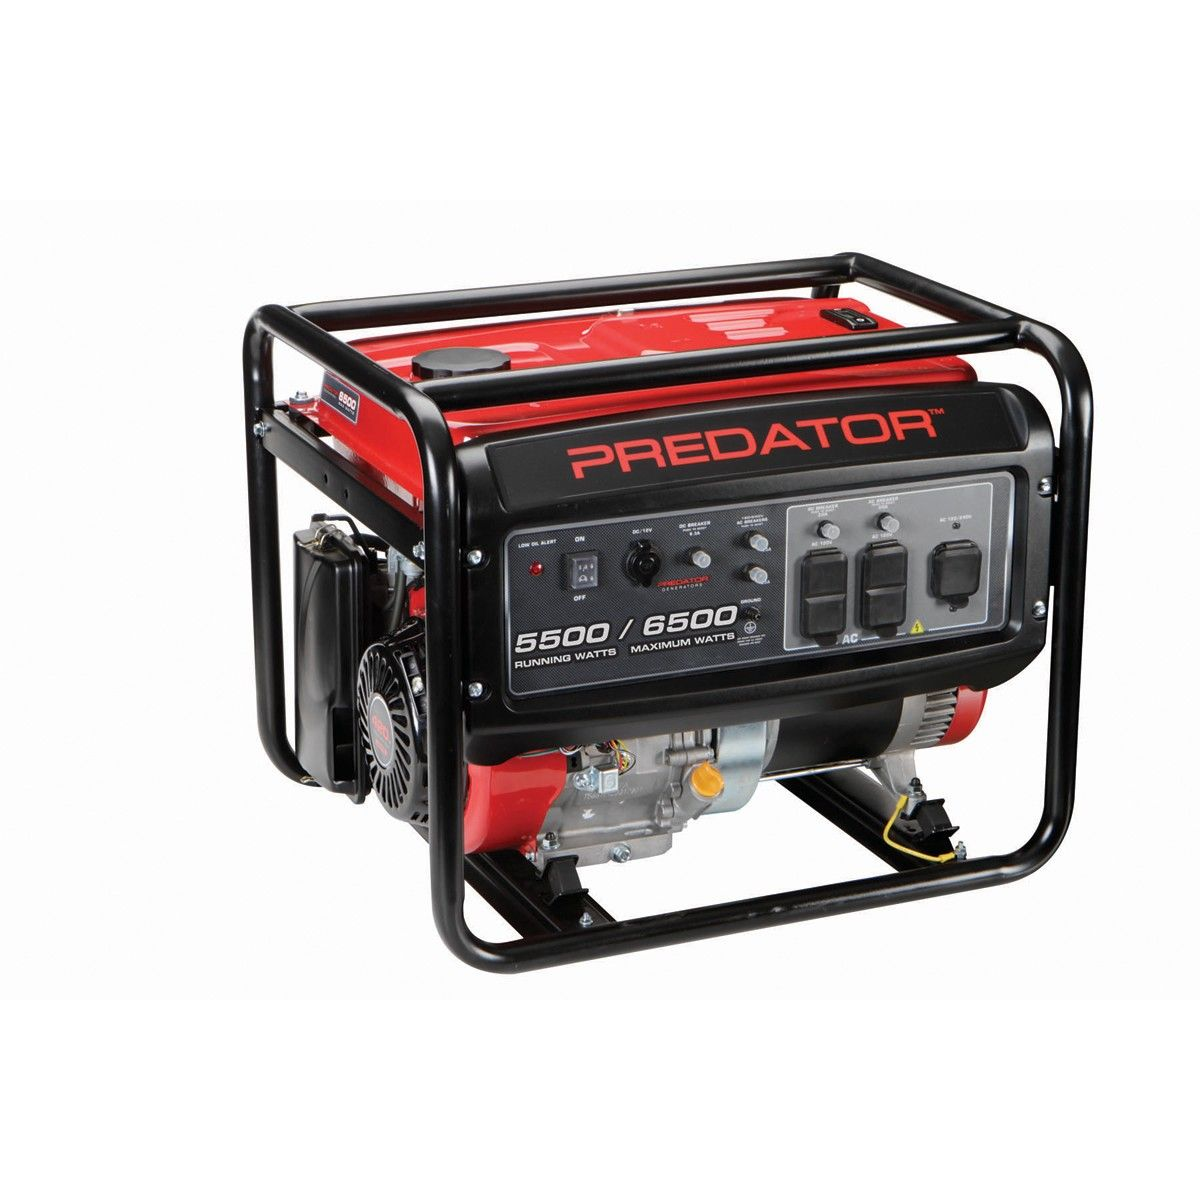 Predator Generators 68529 420cc, 6500 Watts Max/5500 Watts Rated Portable  Generator